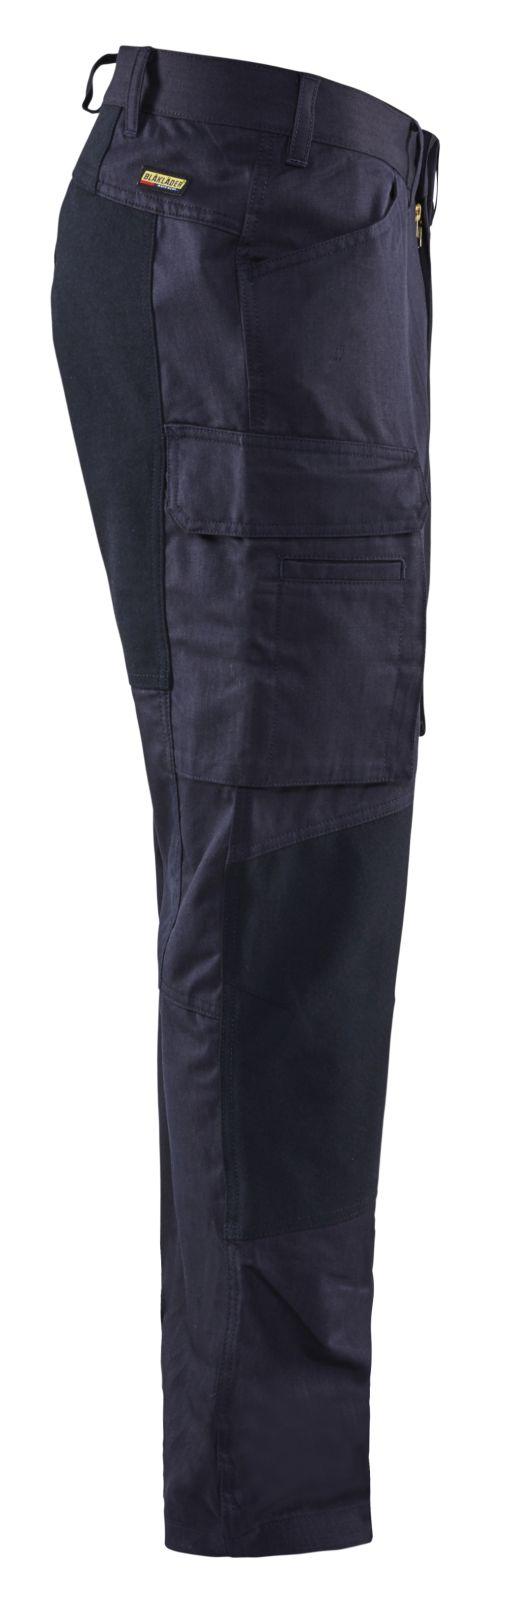 Blaklader Broeken 14861512 met Stretch marineblauw(8900)